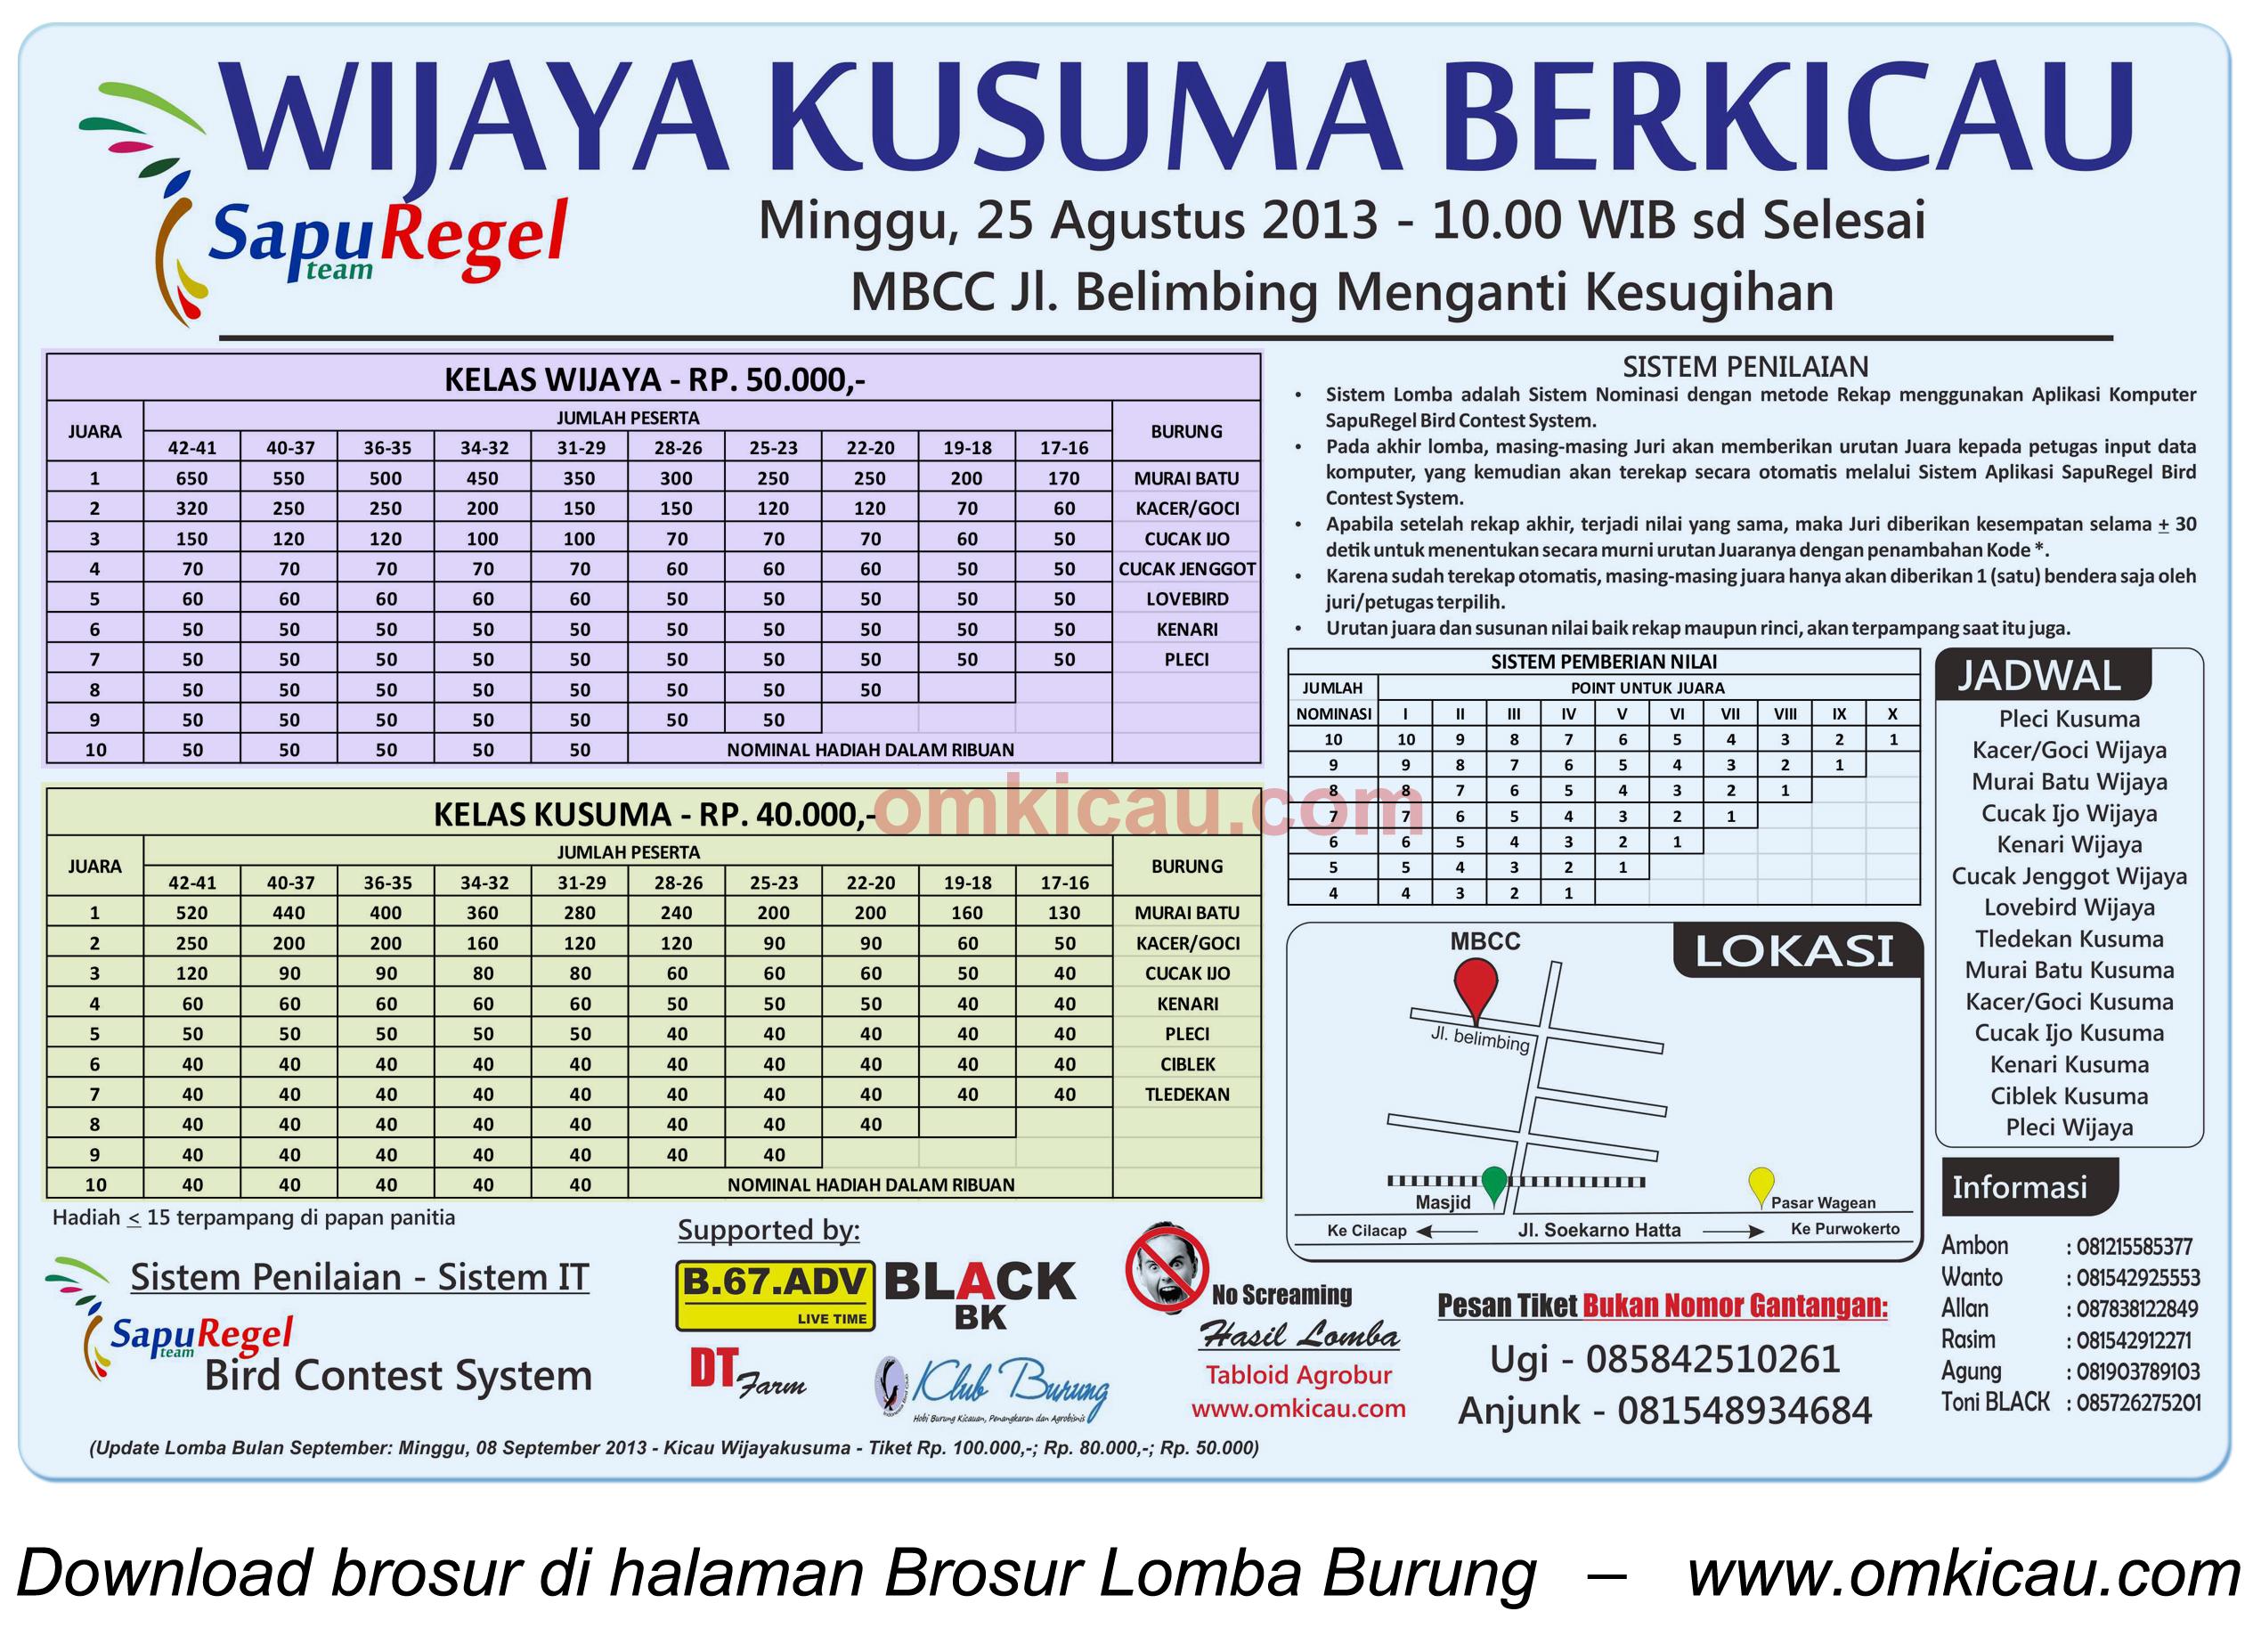 Brosur Lomba Wijaya Kusuma Berkicau - Cilacap 25 Agustus 2013